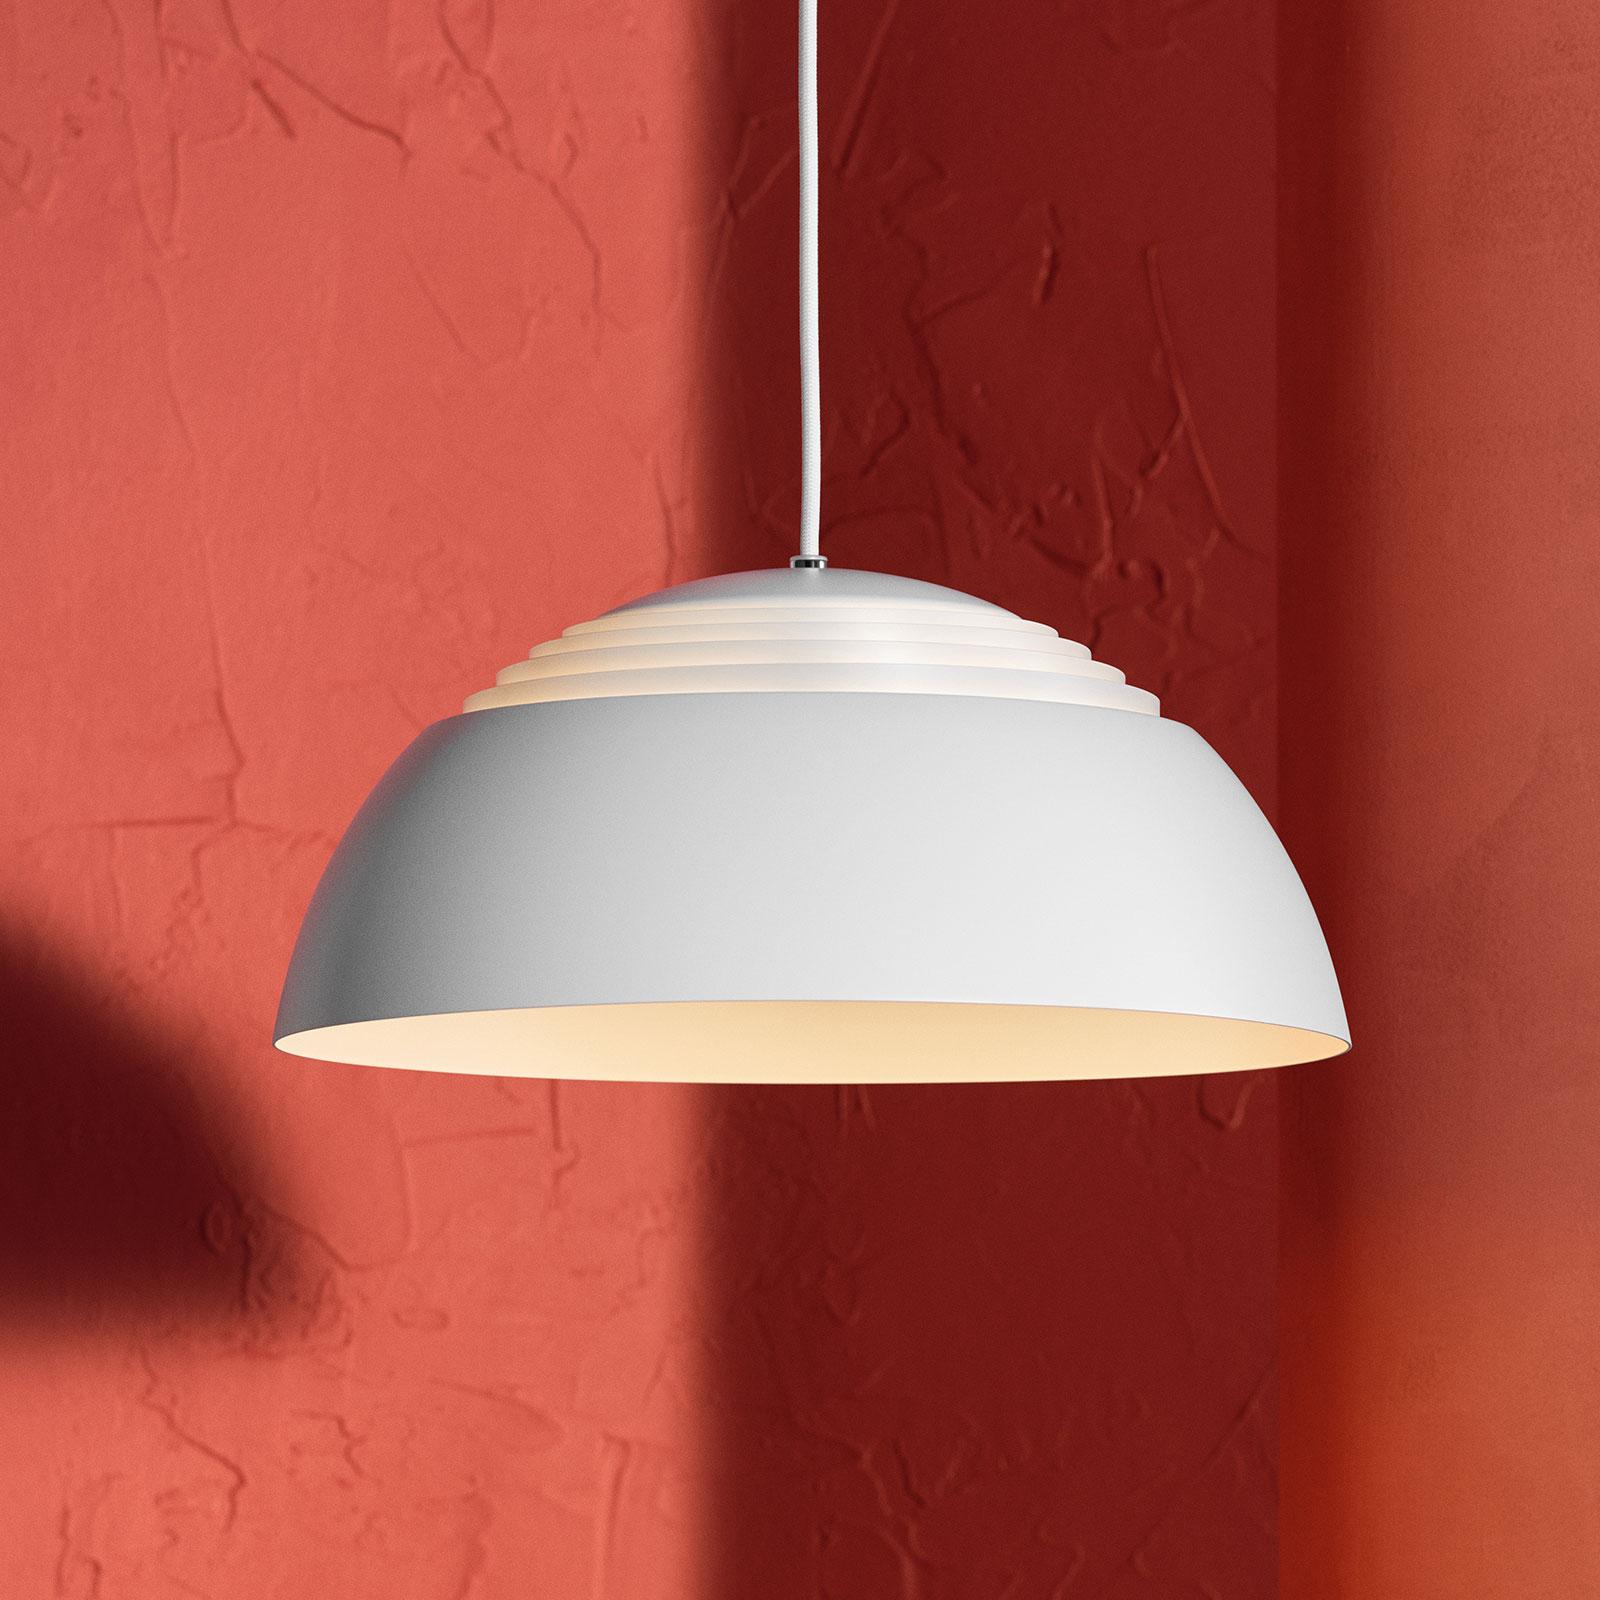 Louis Poulsen AJ Royal LED-hengelampe 25cm hvit